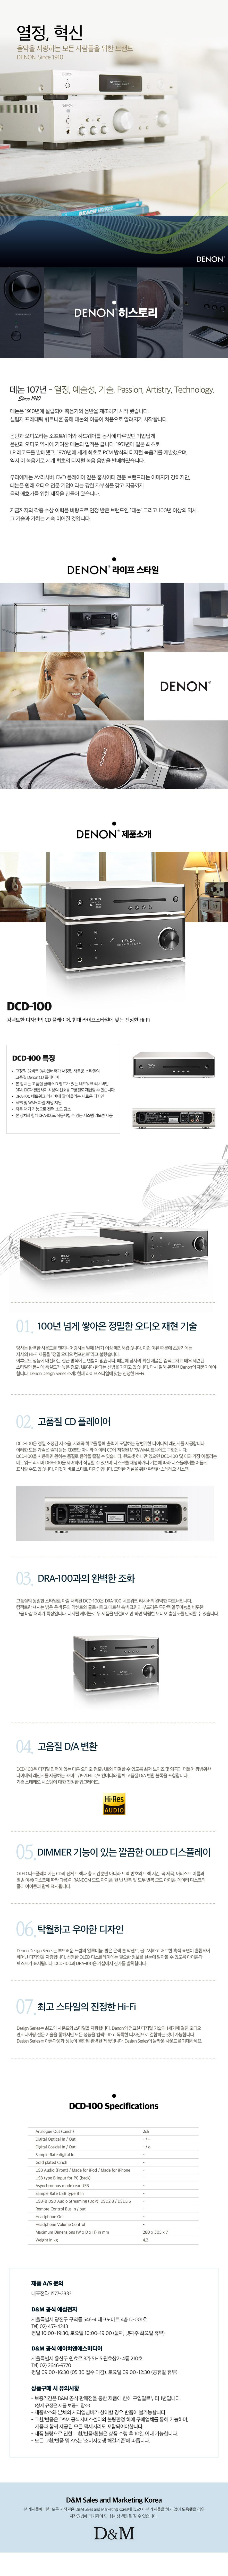 DCD-100(수정)_170926.jpg